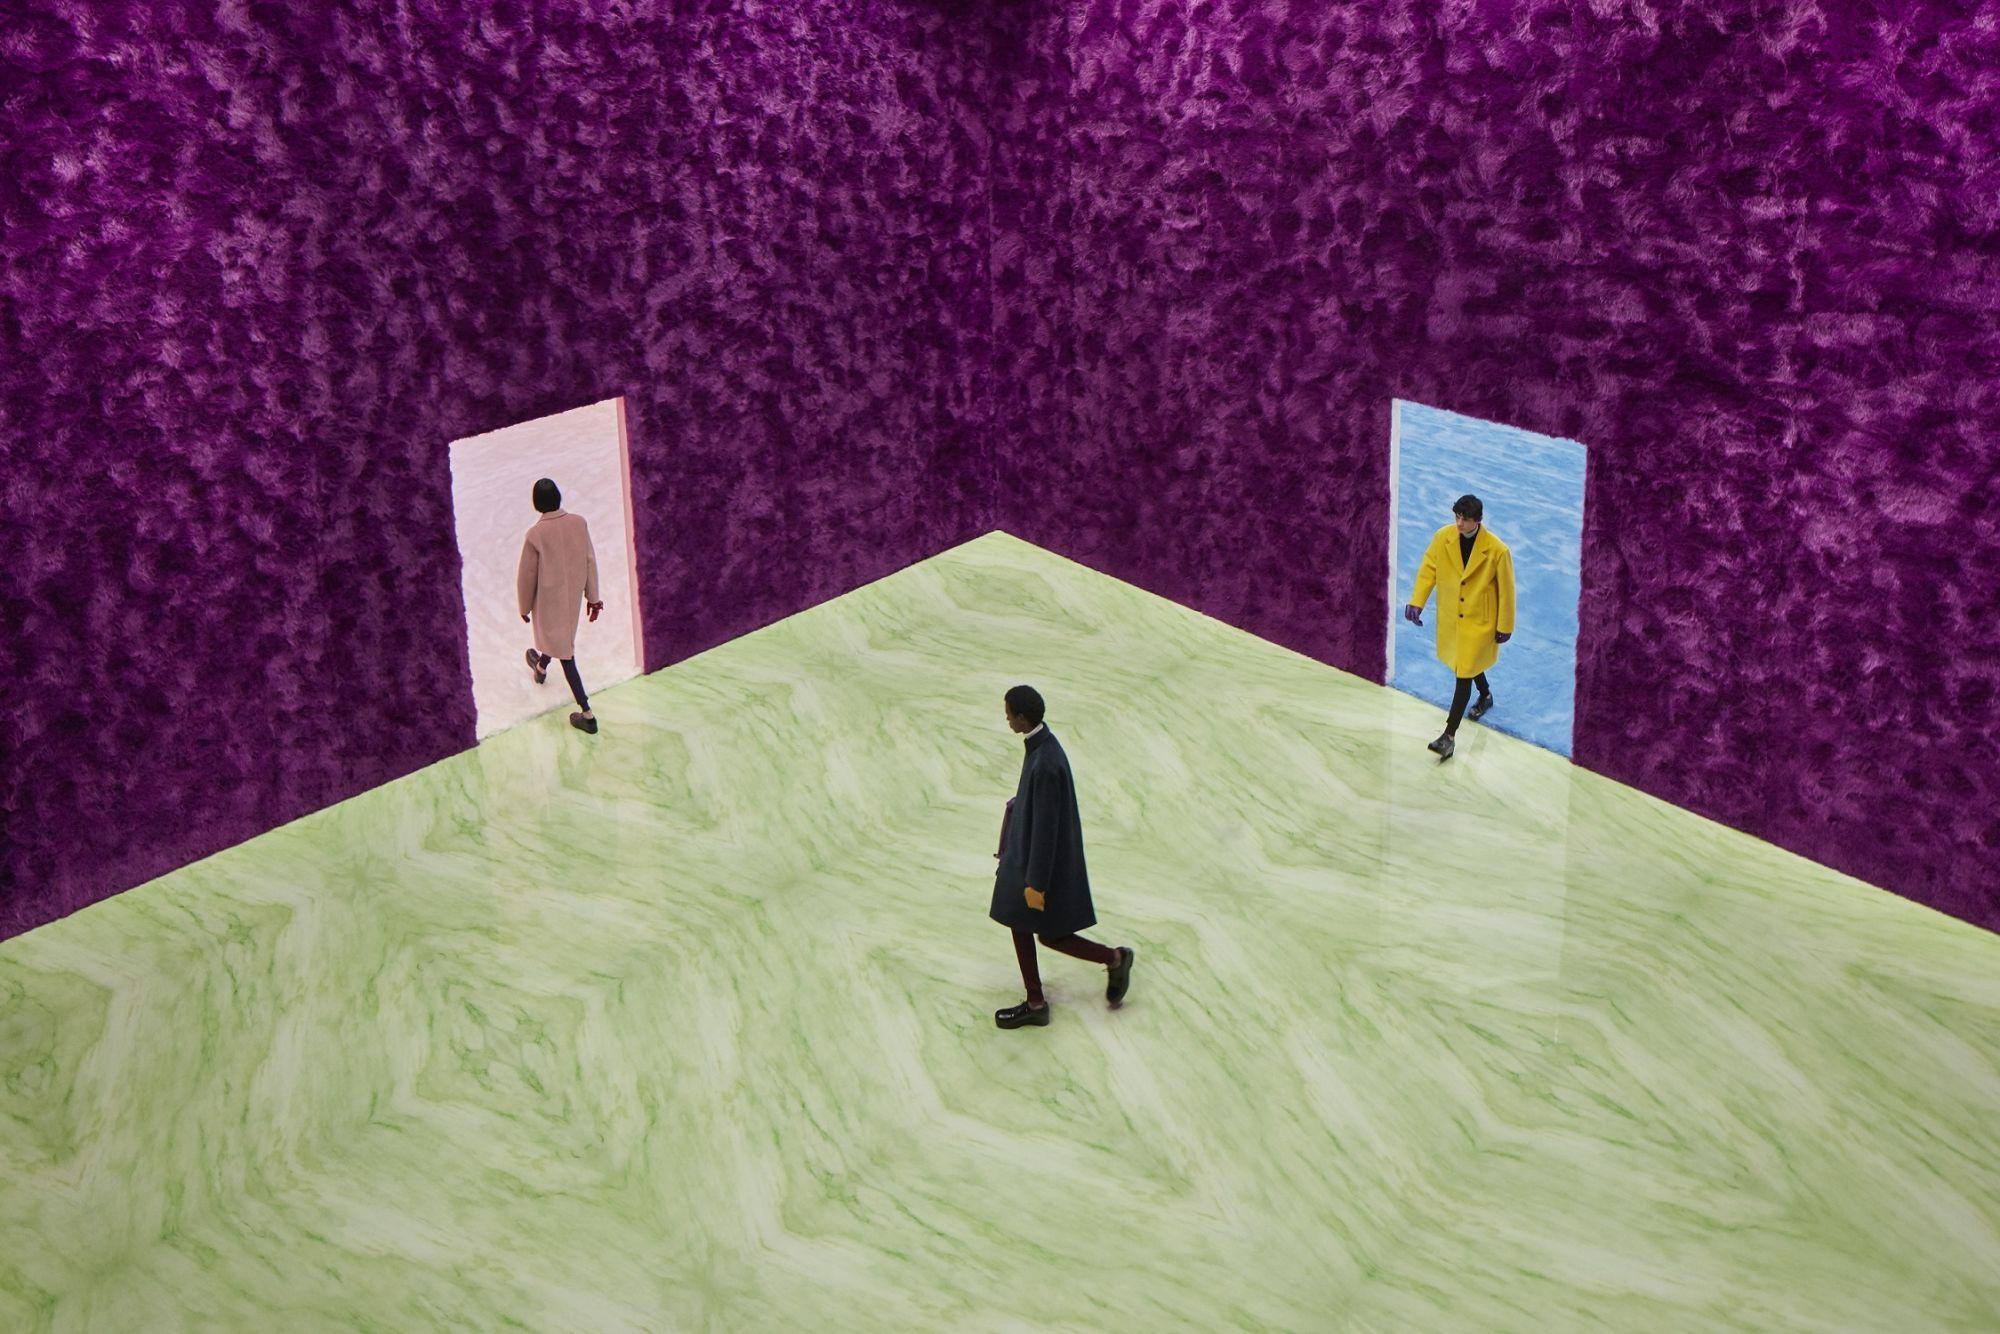 Prada 2021秋冬男裝:極簡廓型+對比色塊的 Prada 男孩,Raf Simons 風格制霸秀場設計